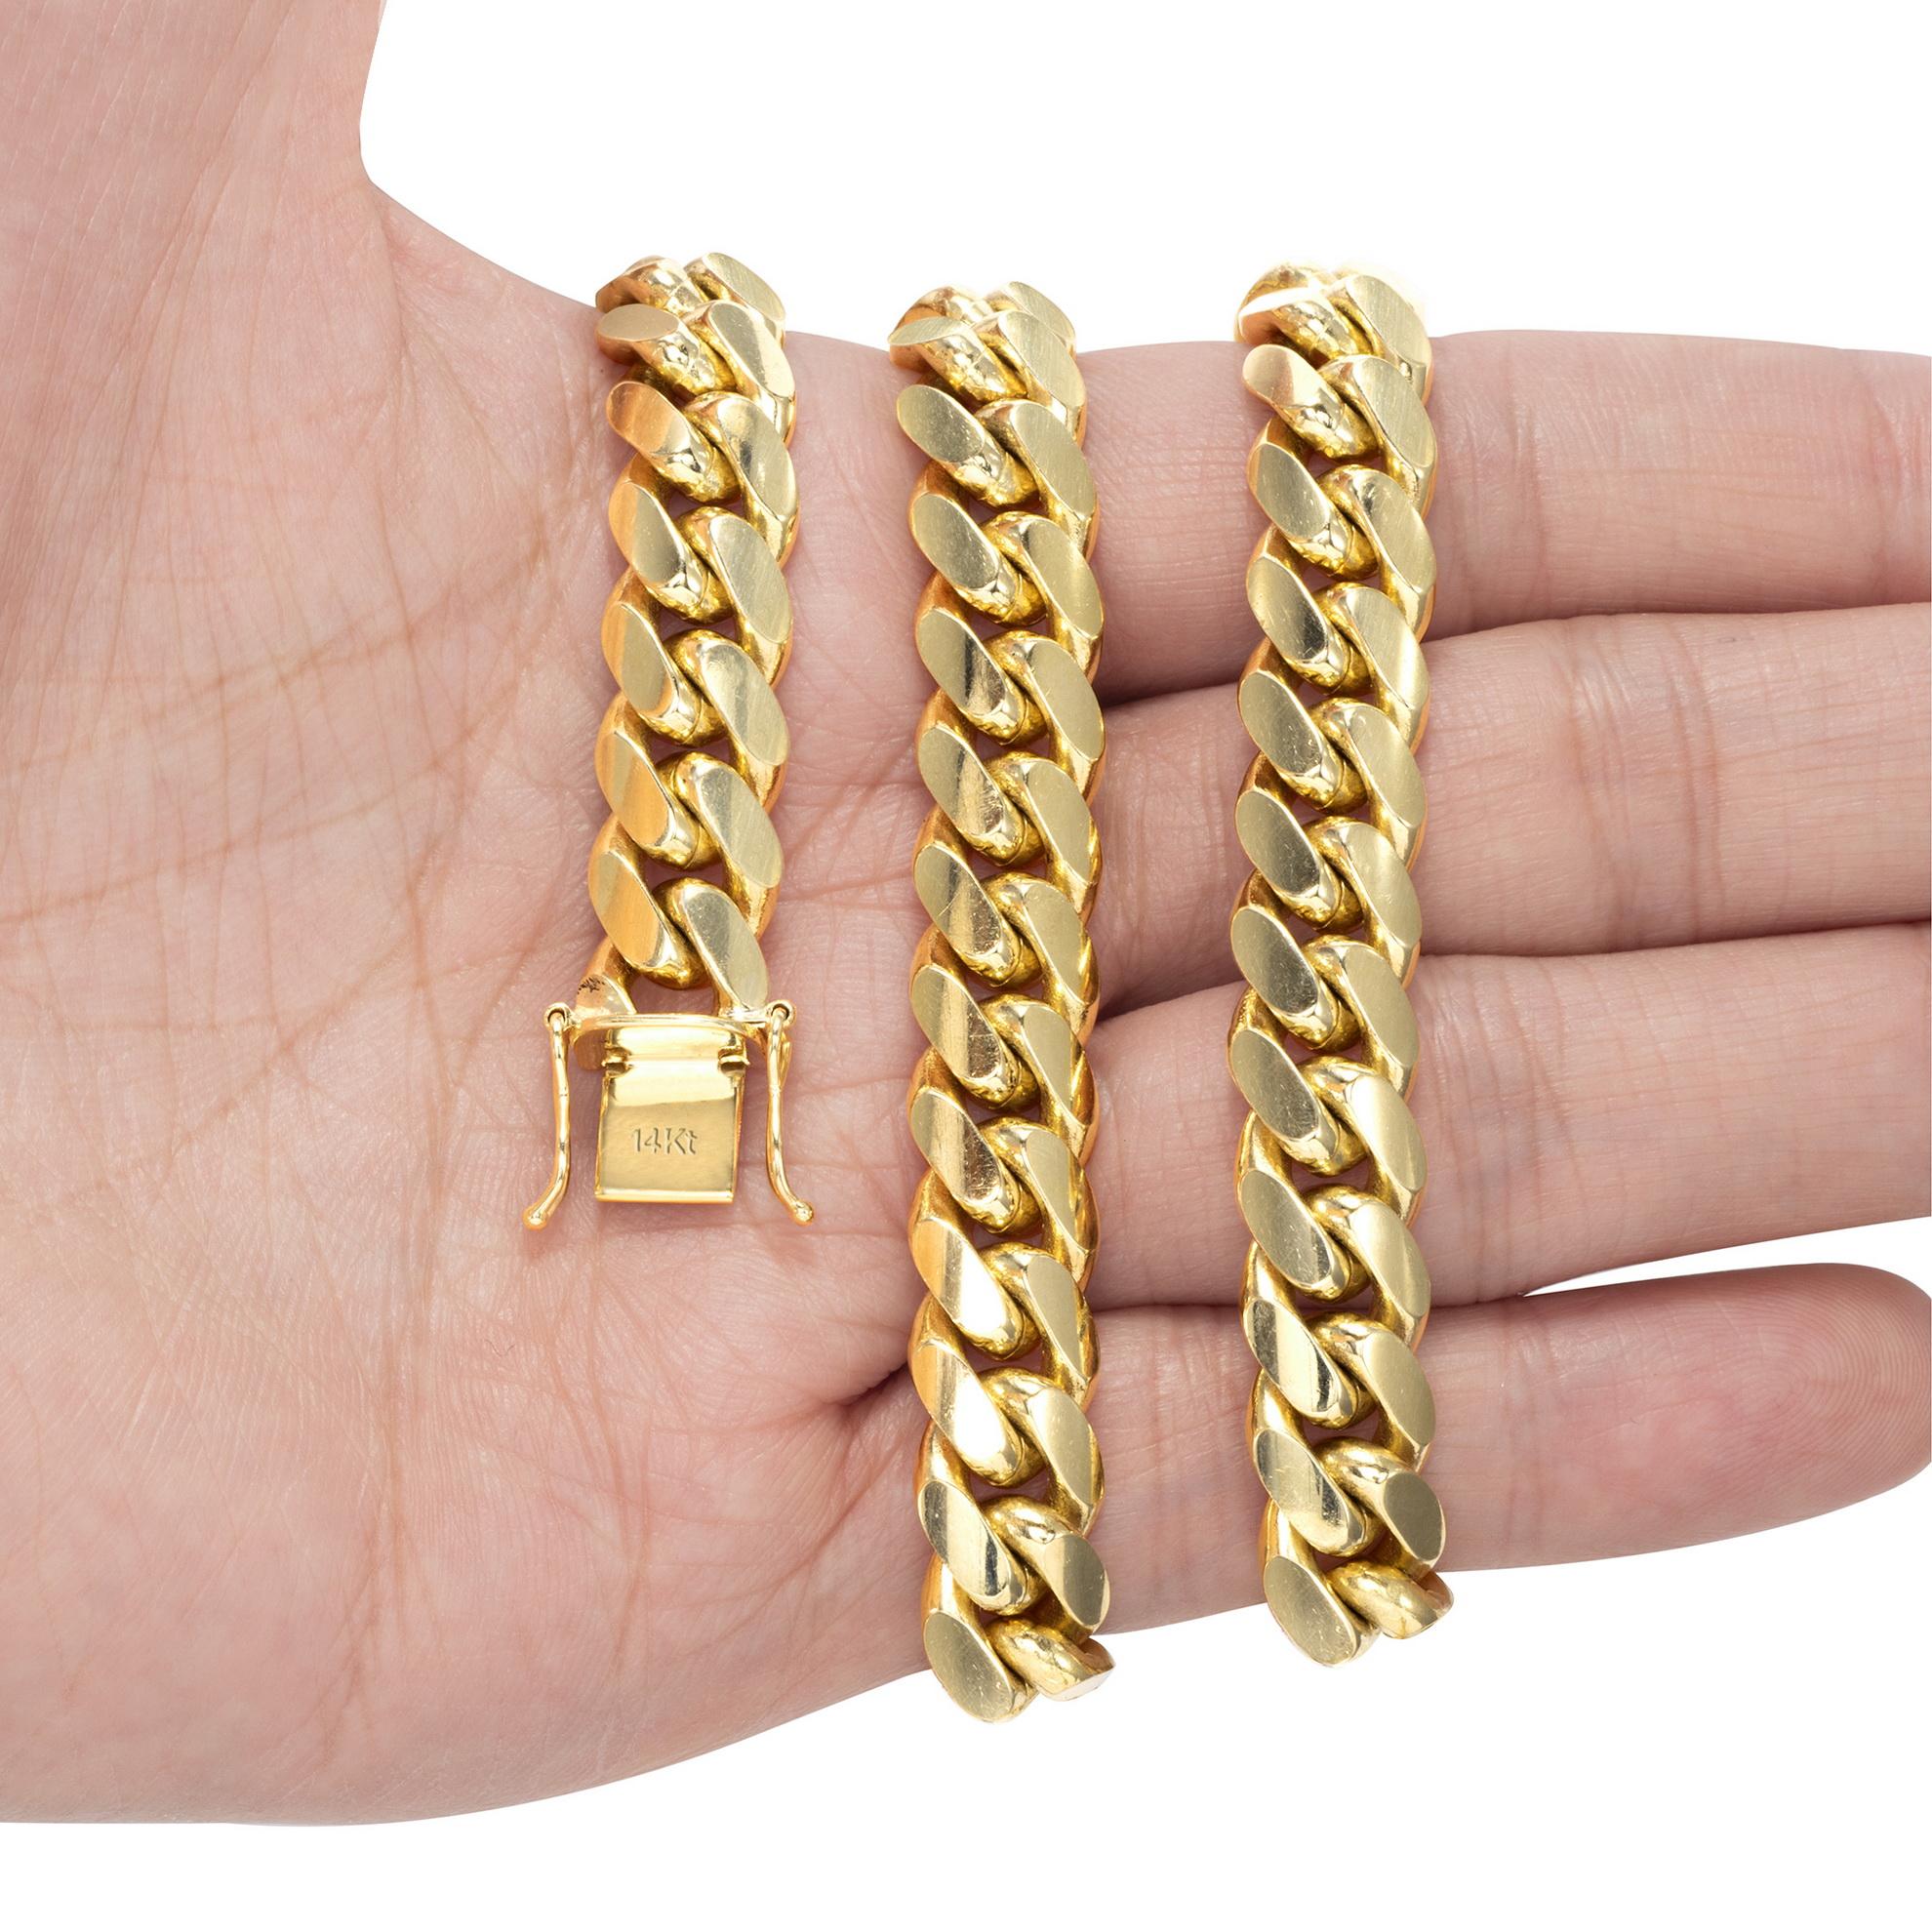 14K-Yellow-Gold-Solid-2-7mm-11mm-Miami-Cuban-Link-Chain-Bracelet-Men-Women-7-034-9-034 thumbnail 9